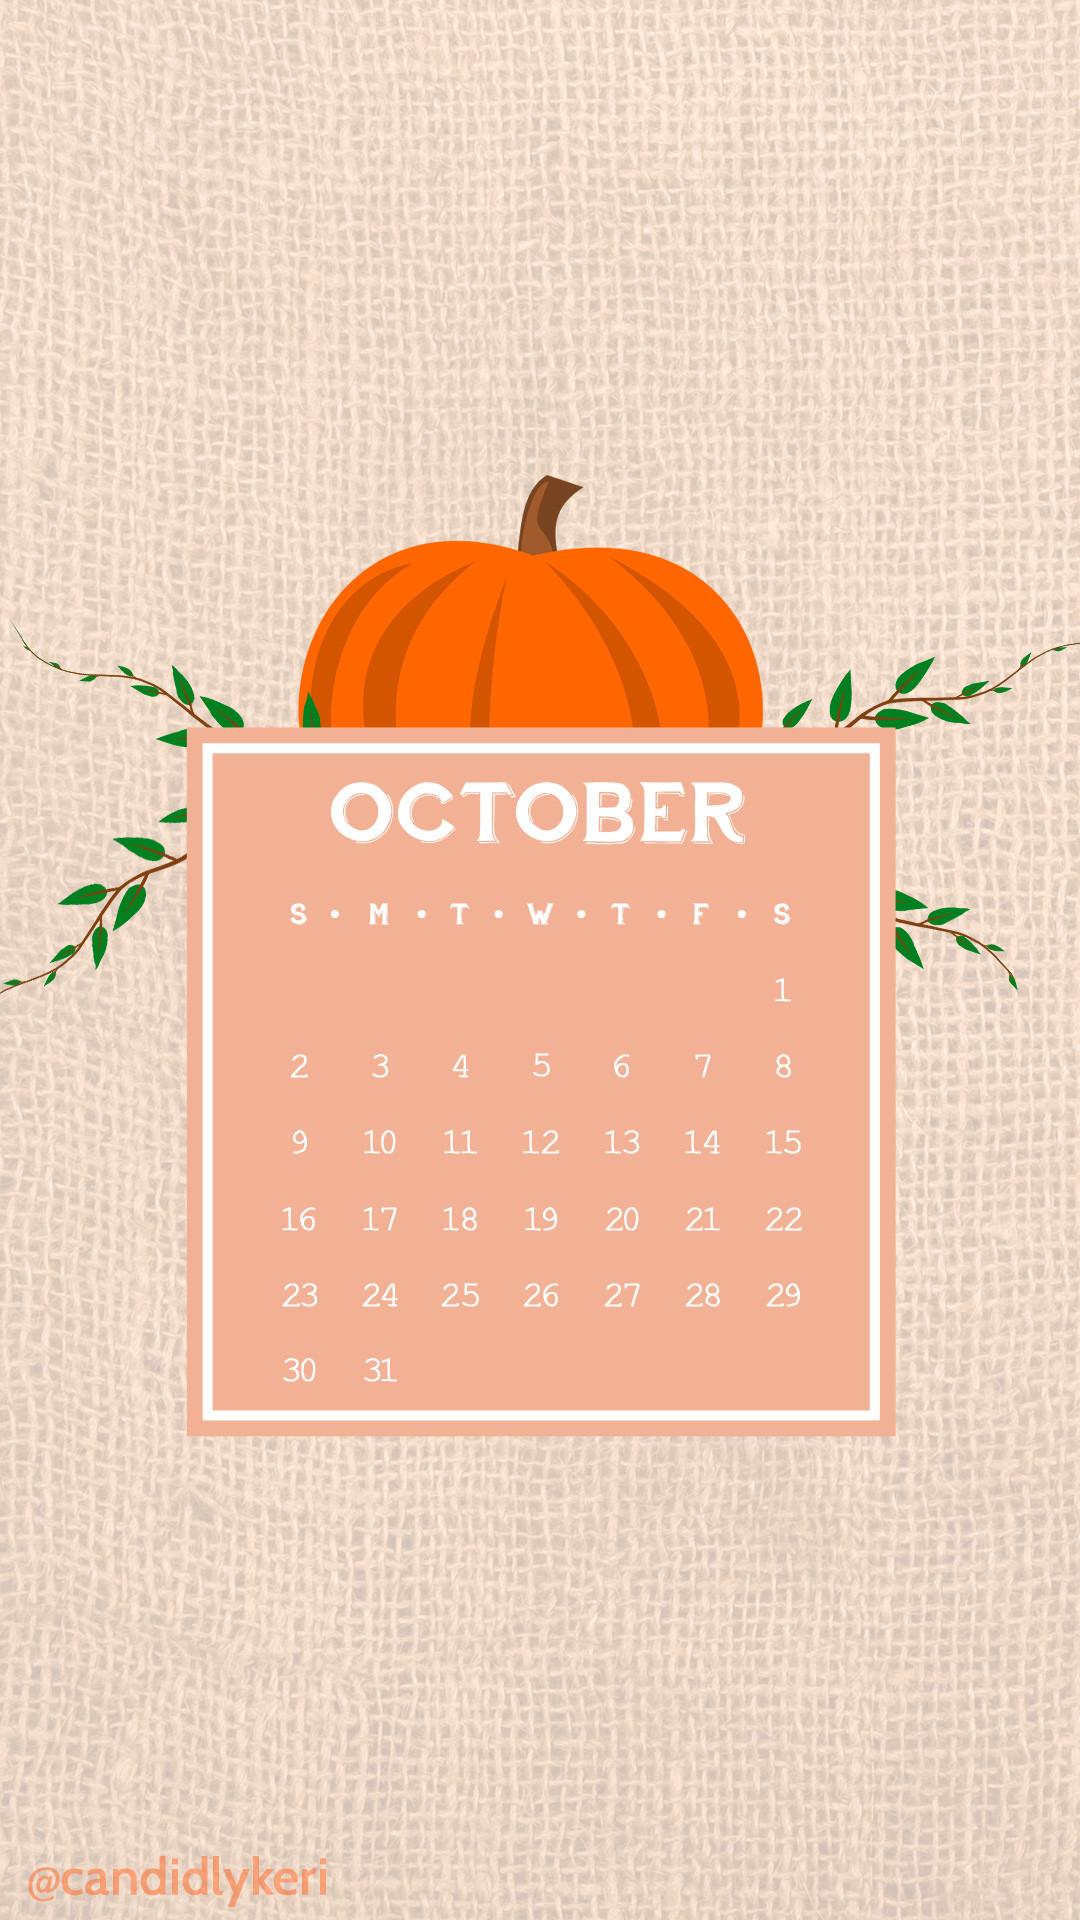 1080x1920 Cute Cartoon Pumpkin Vector Burlap Sack October Calendar 2016  Wallpaper You Can Download For Free